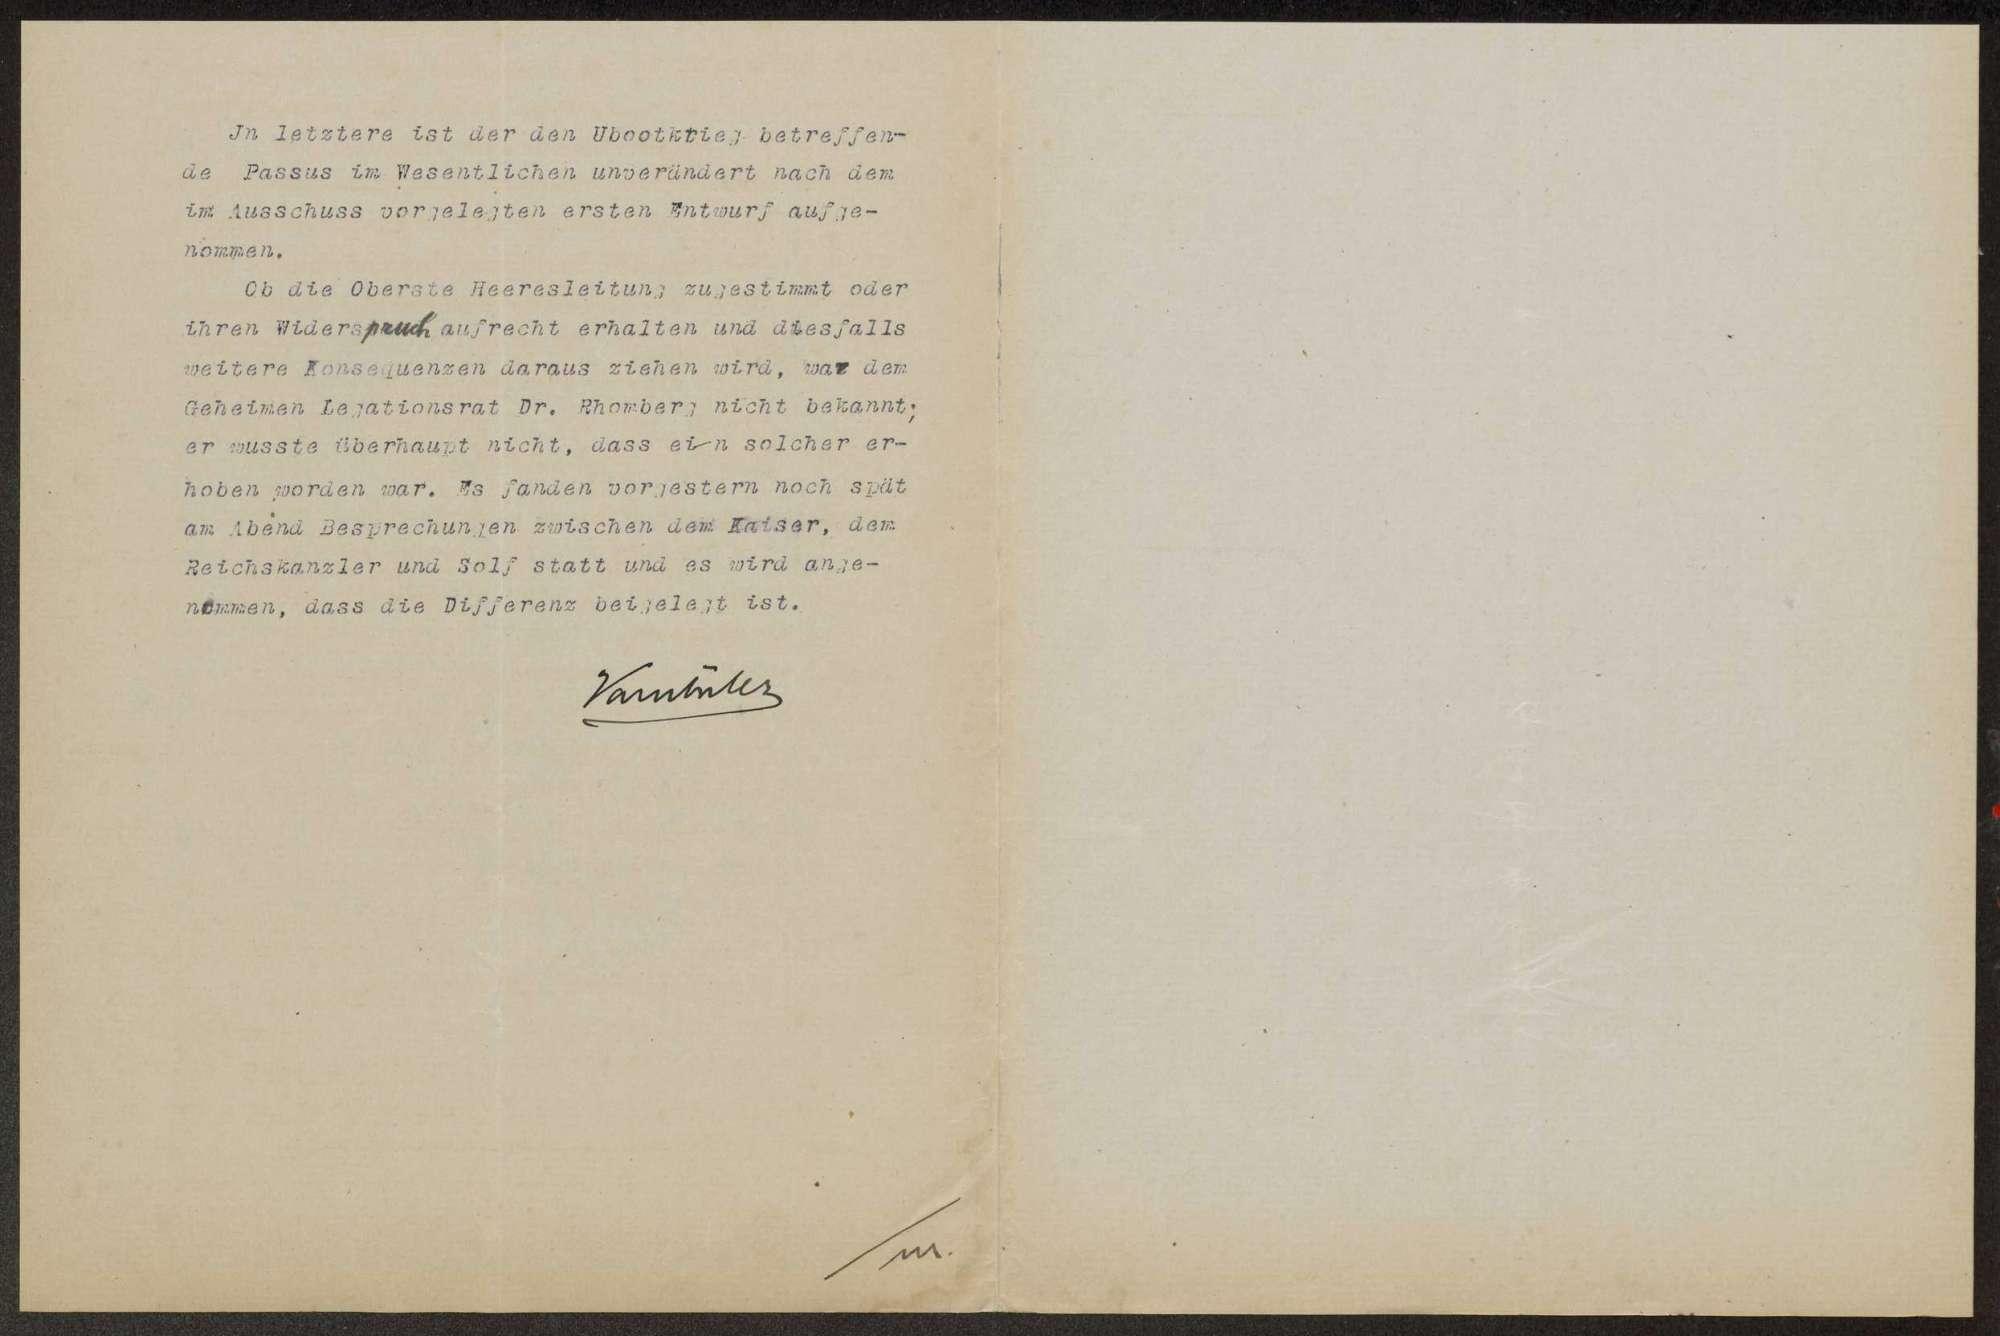 Sitzungen des VIII. Bundesratsausschusses für auswärtige Angelegenheiten am 16. Januar 1917, 9. Mai 1917, 20. August 1917, 26. November 1917, 2. Januar 1918, 22. Mai 1918 und 20. Okotber 1918. Protokolle, Notizen, Berichte, Bild 3